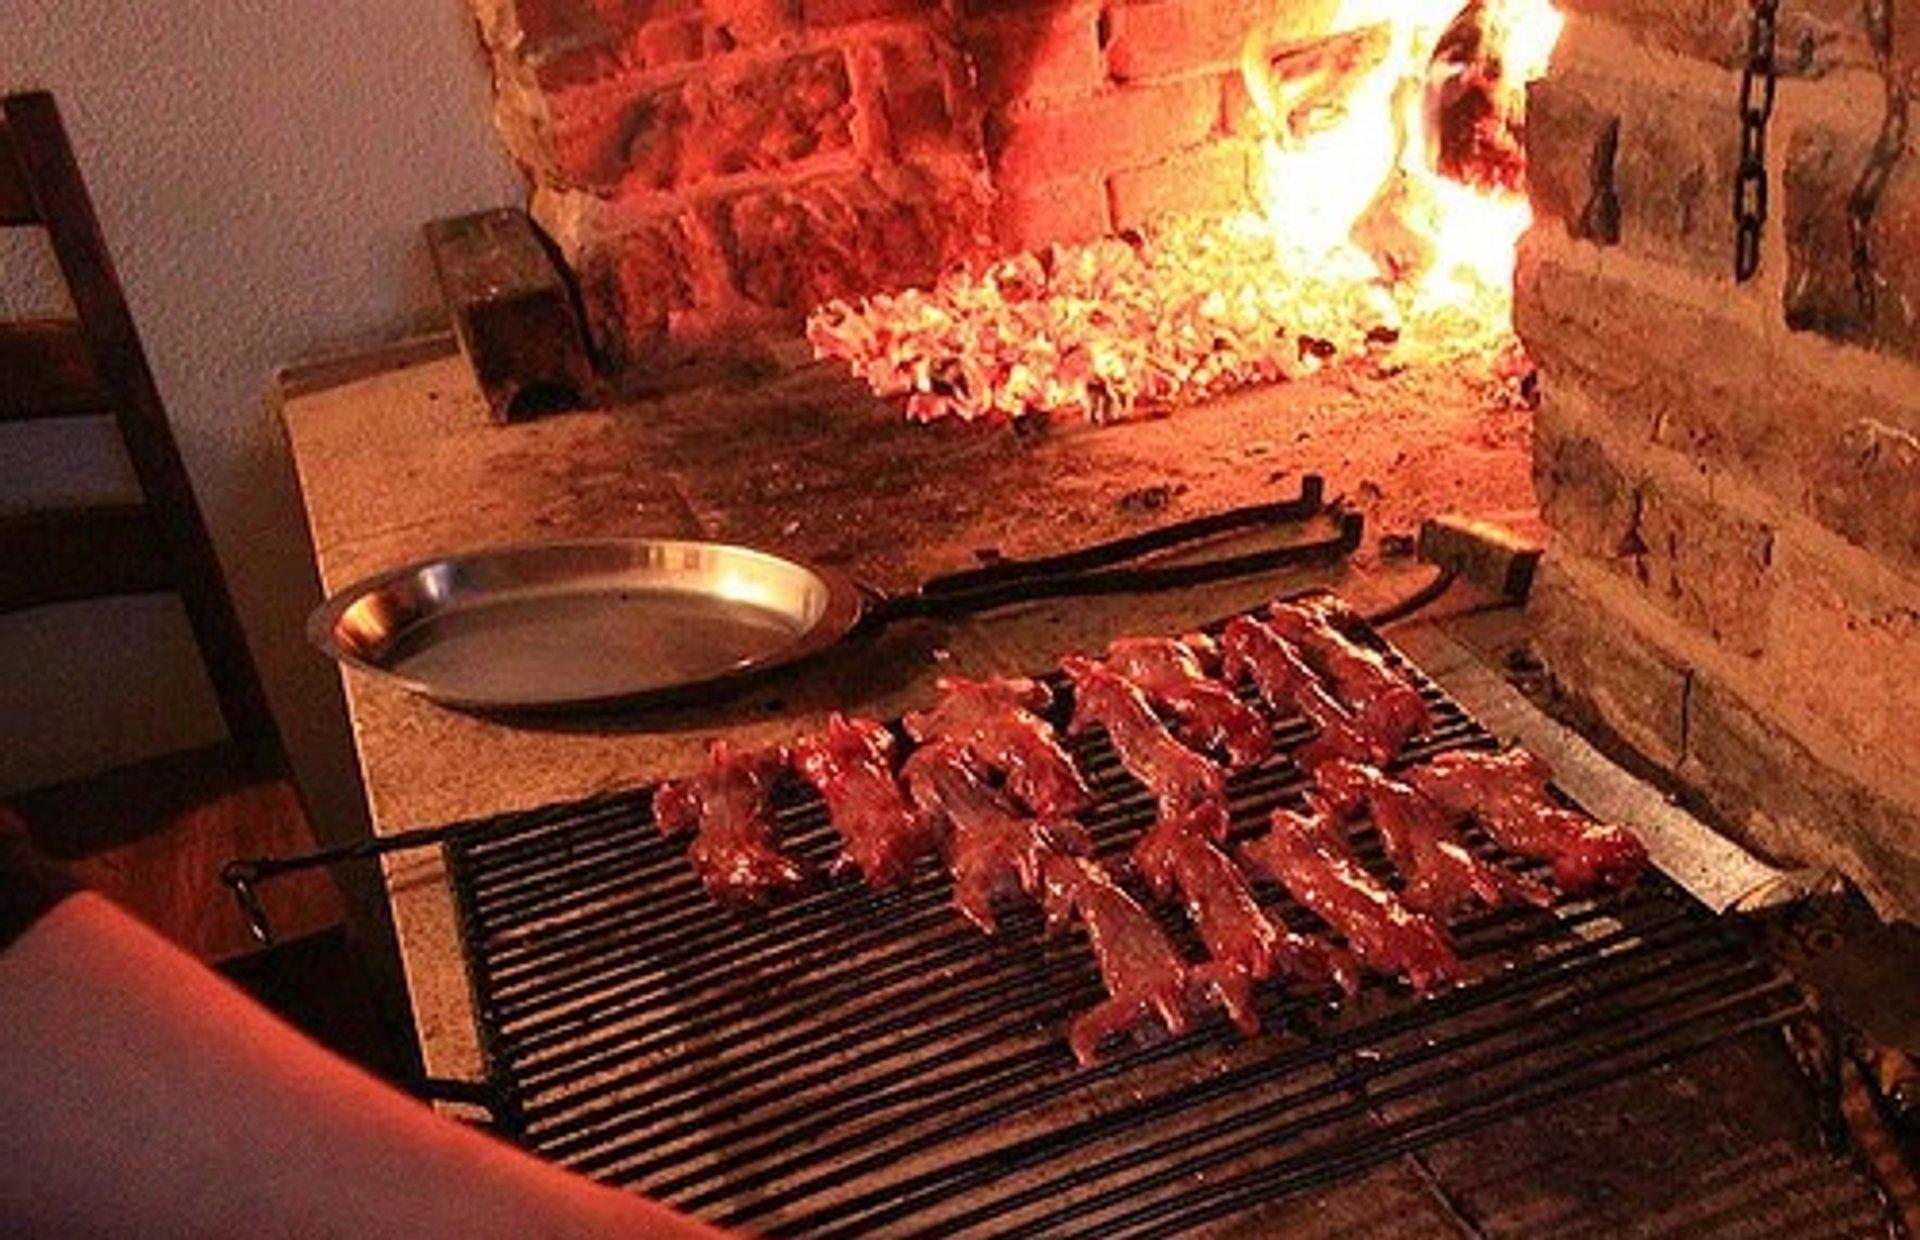 Fried Dormice in Croatia 2020 - Best Time